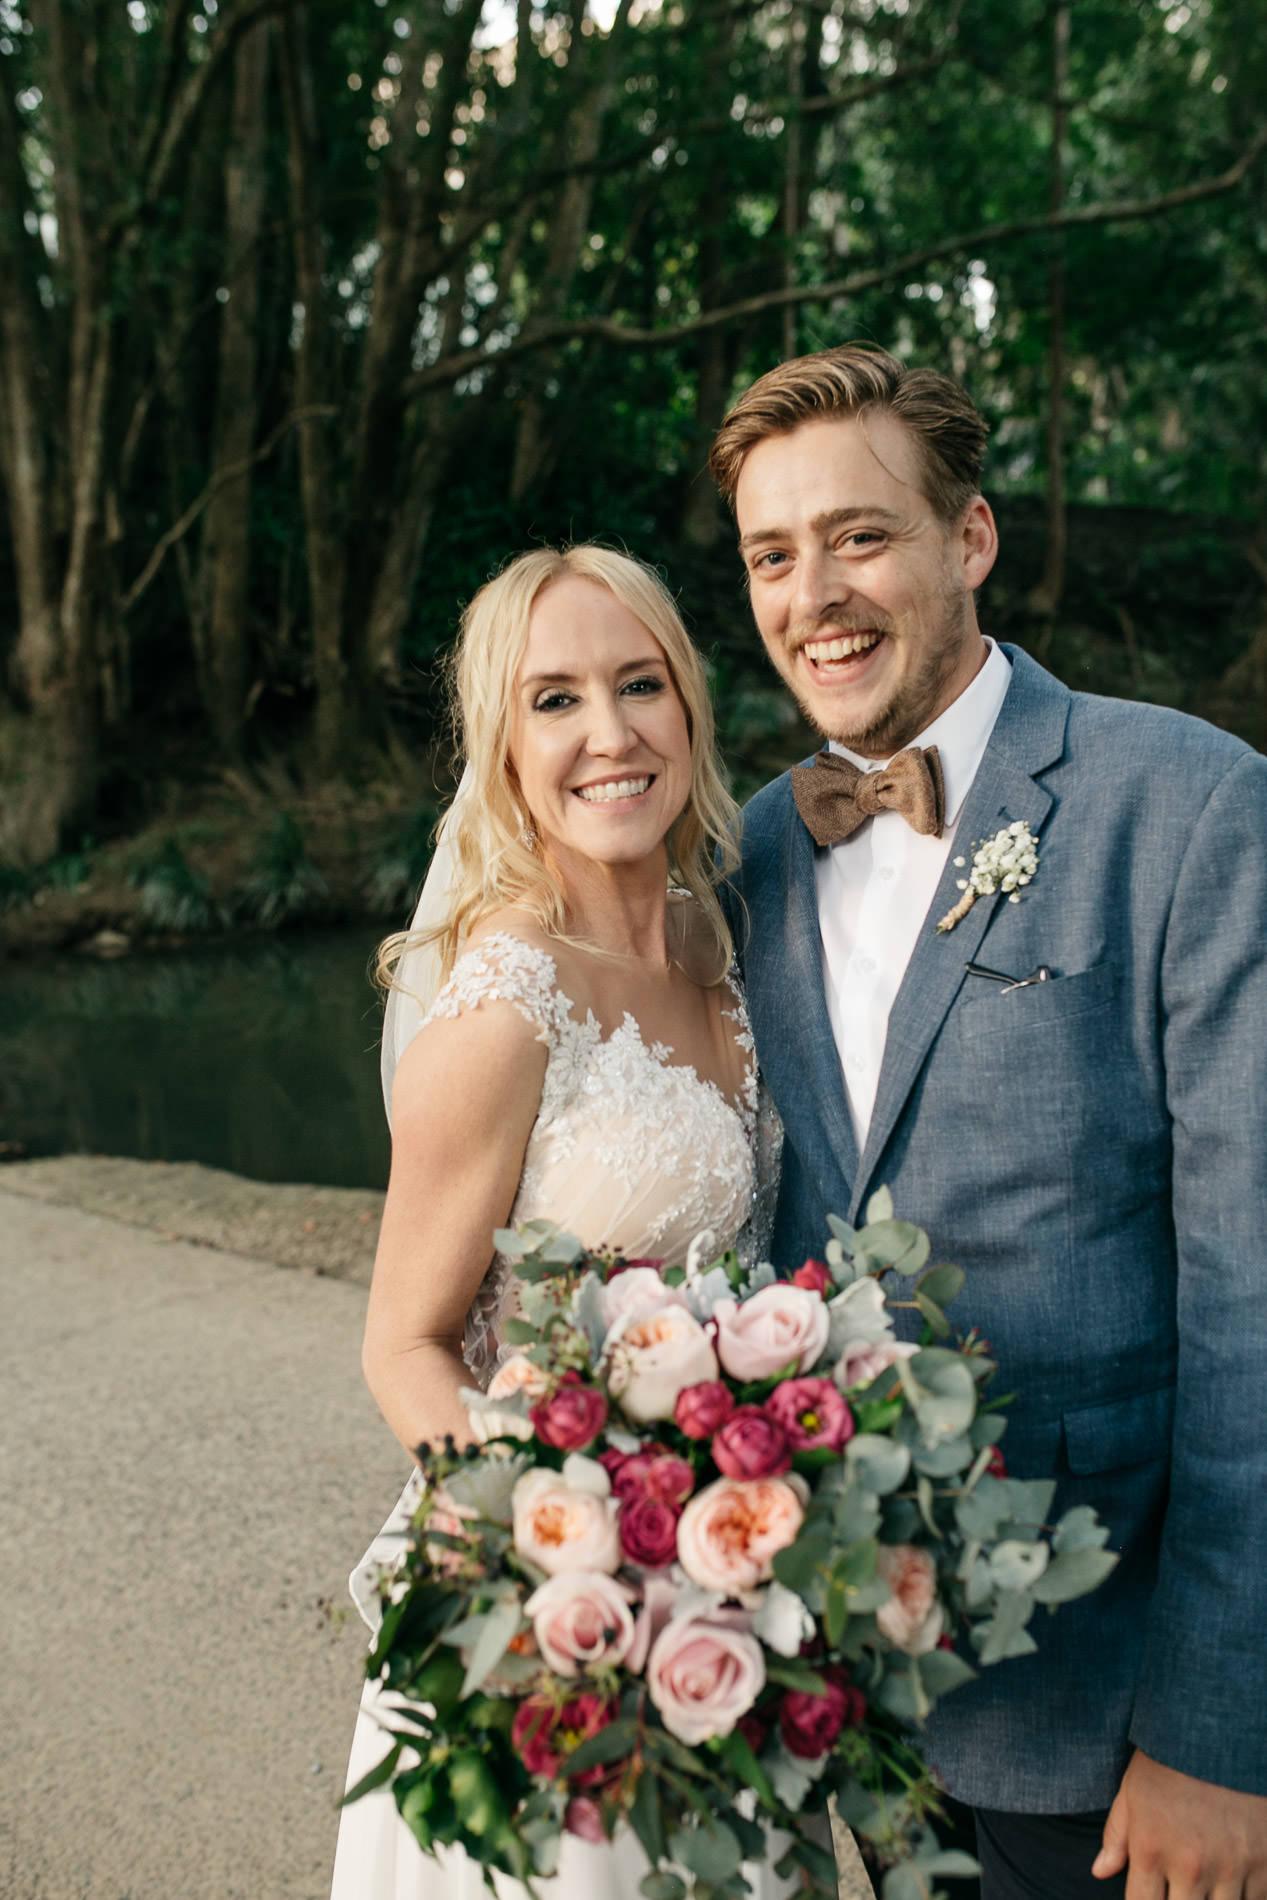 True North Photography_Boomerang Farm_Stacey and Isaac_Gold Coast Wedding_Barm Wedding_Hinterland Wedding-158.jpg